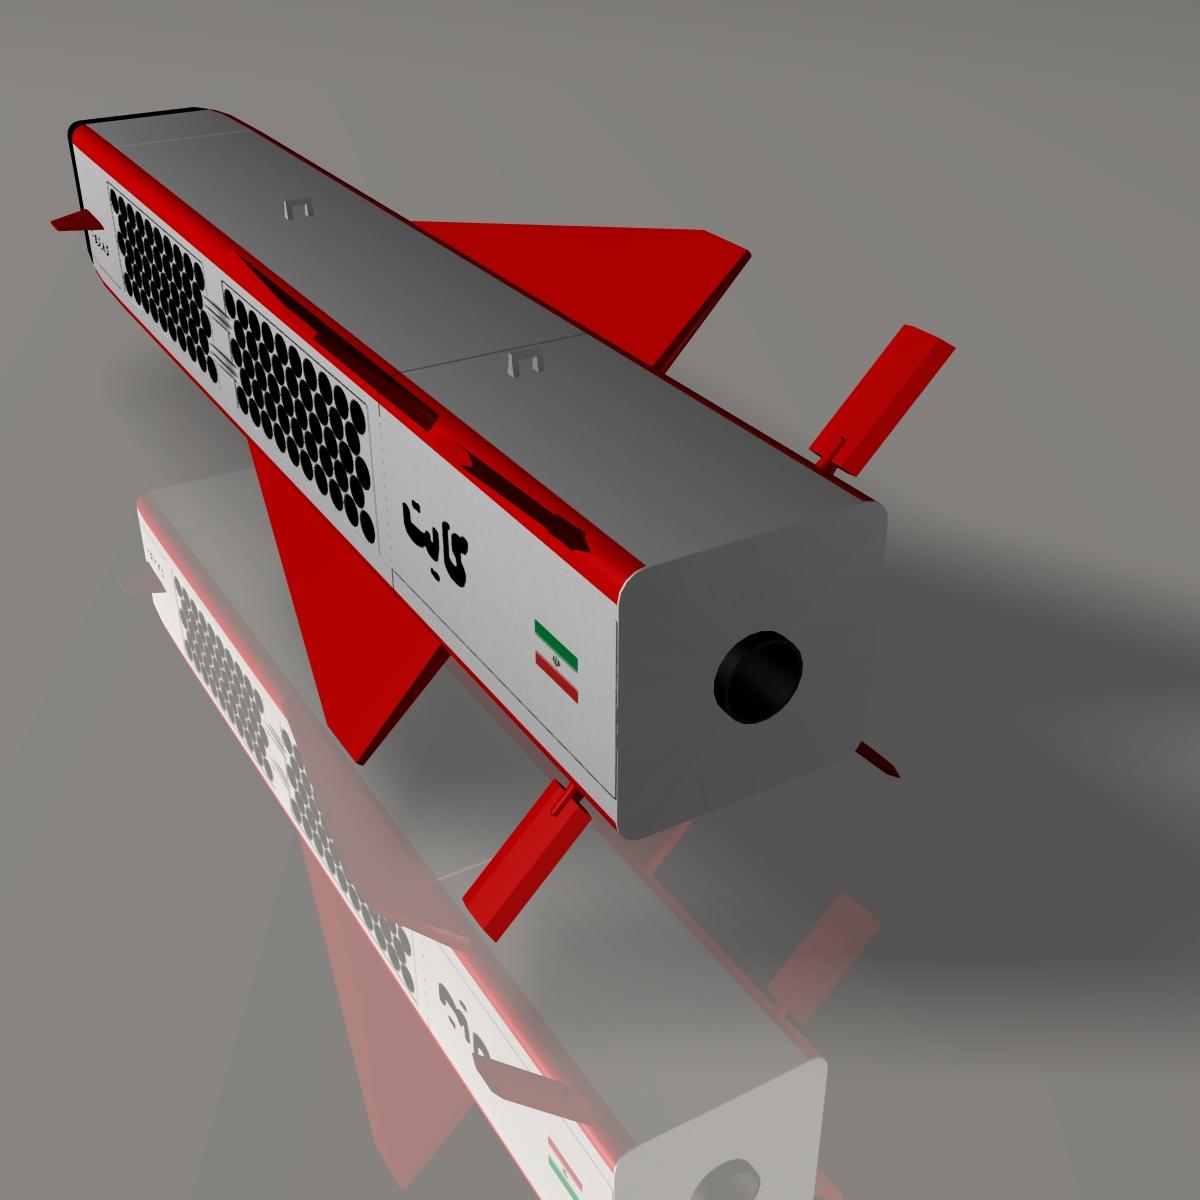 iranian kite, 184 round 3d model 3ds dxf cob x obj 146848